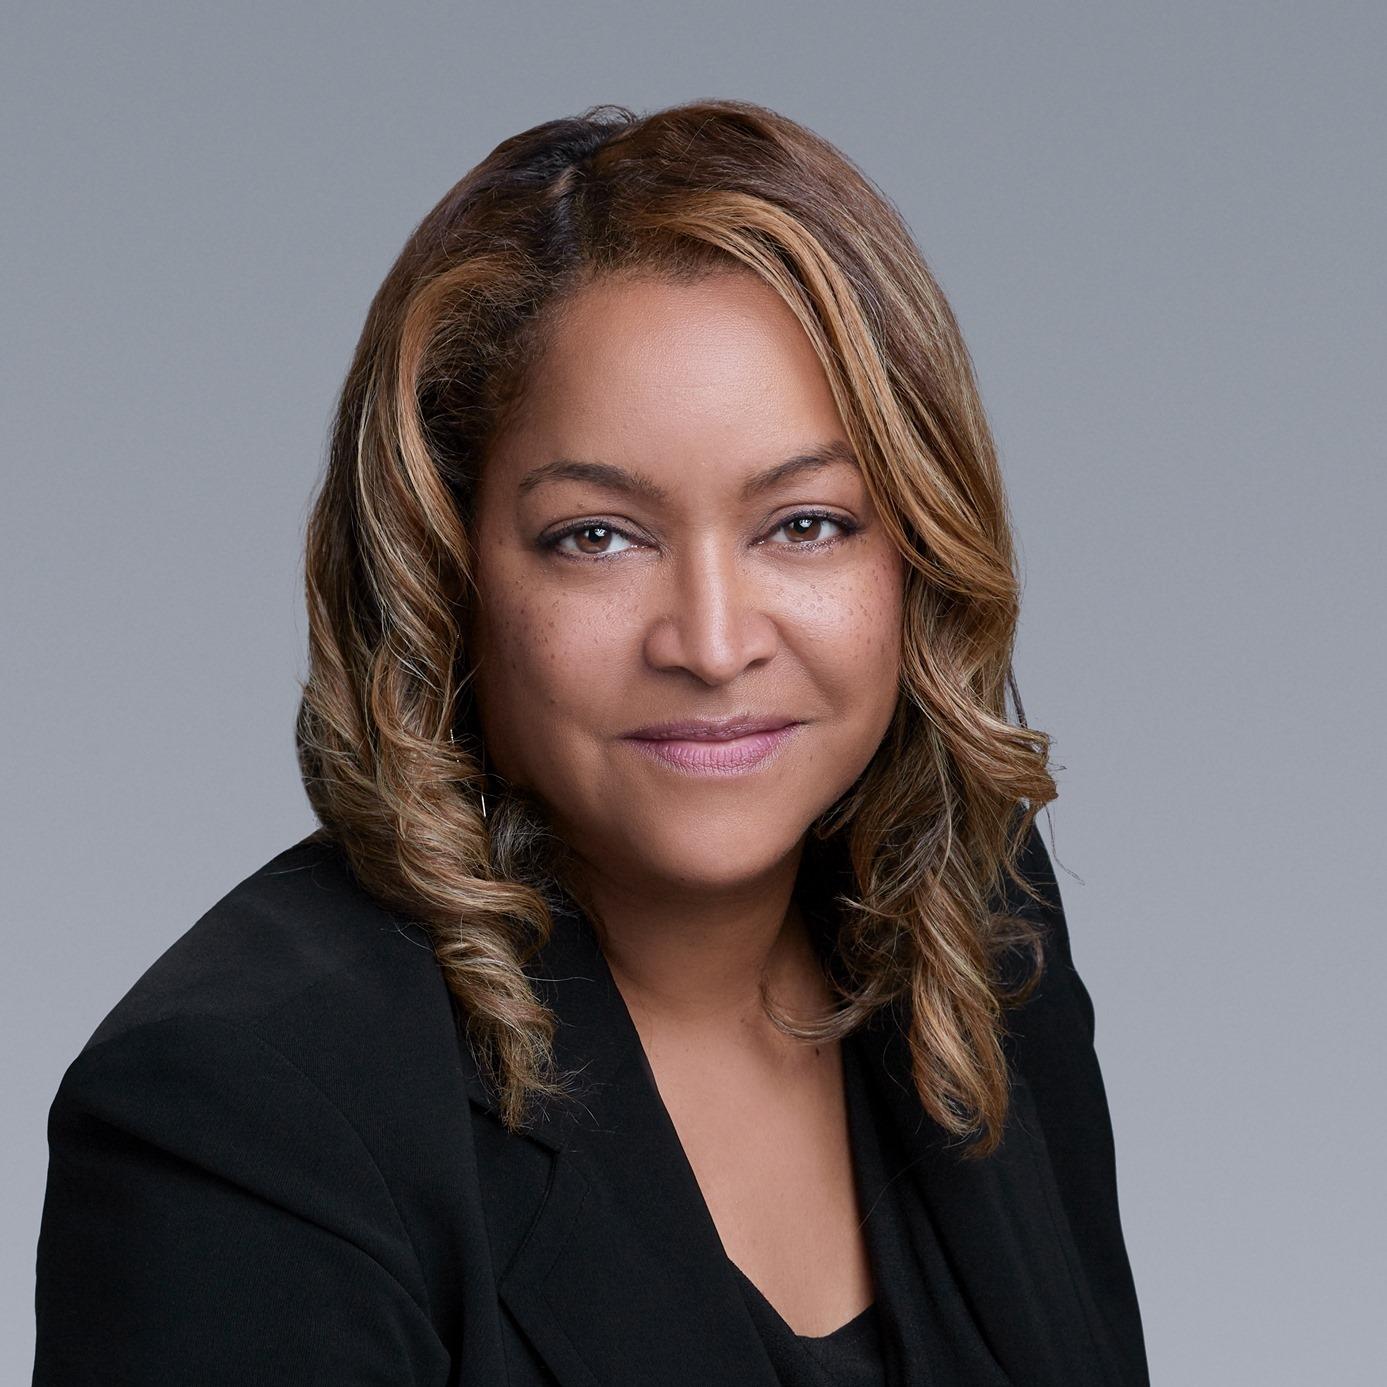 Pam Jackson